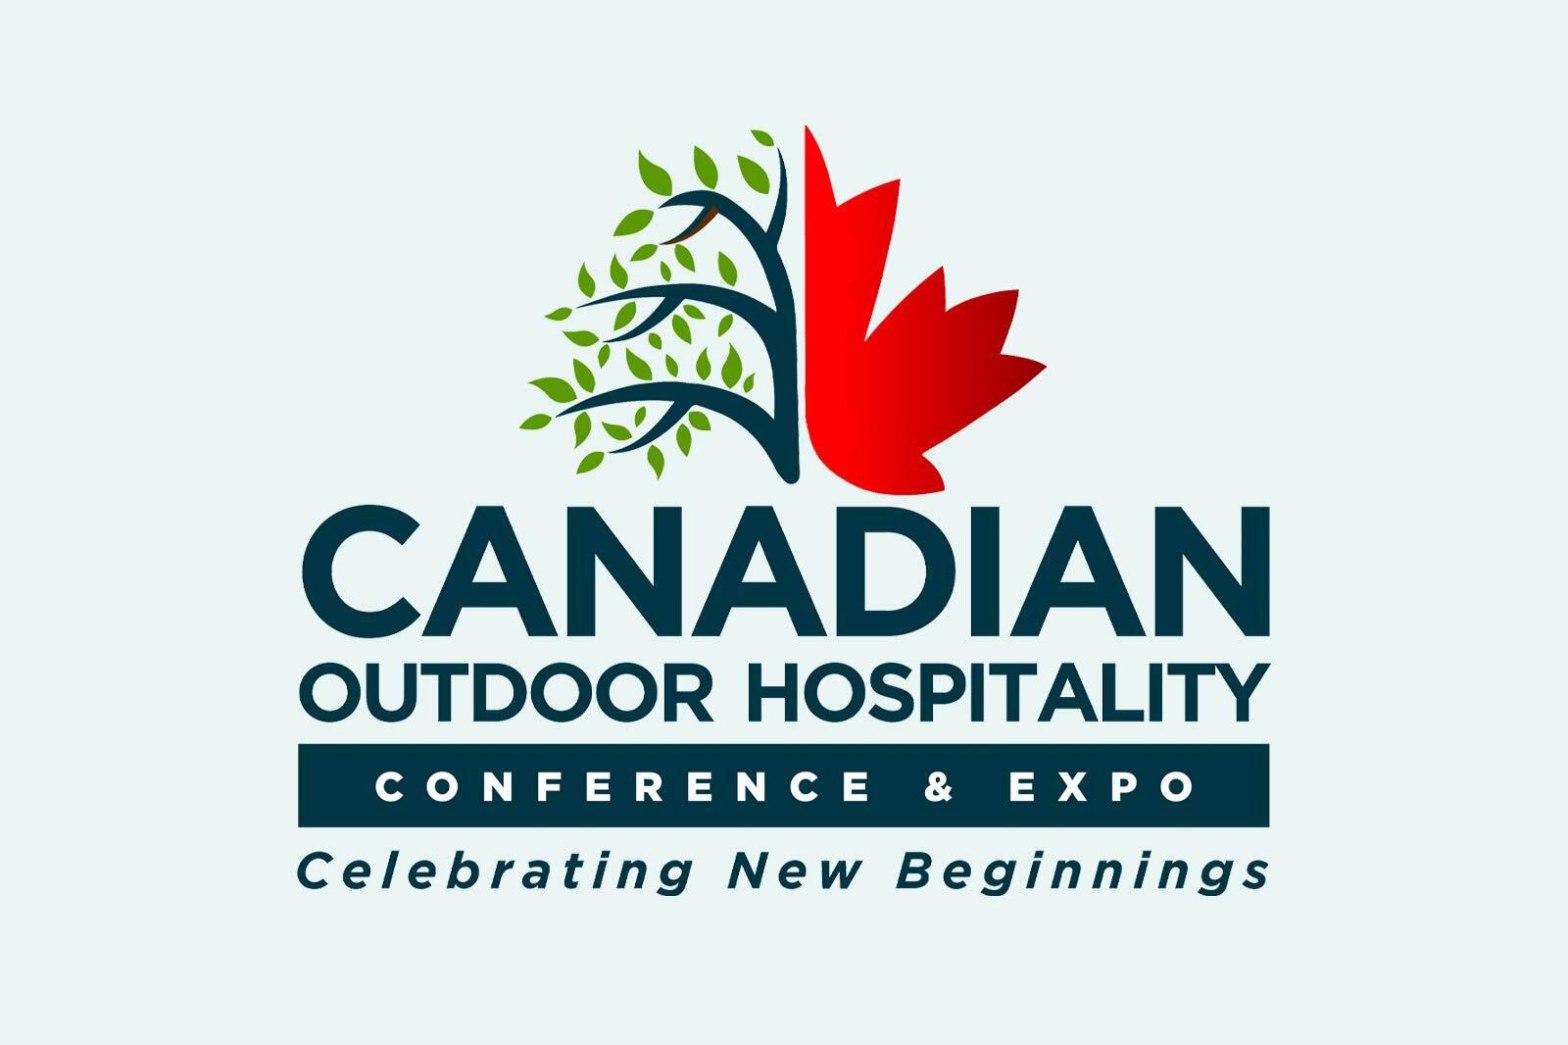 half leaf half tree logo for Canadian outdoor hospitality expo